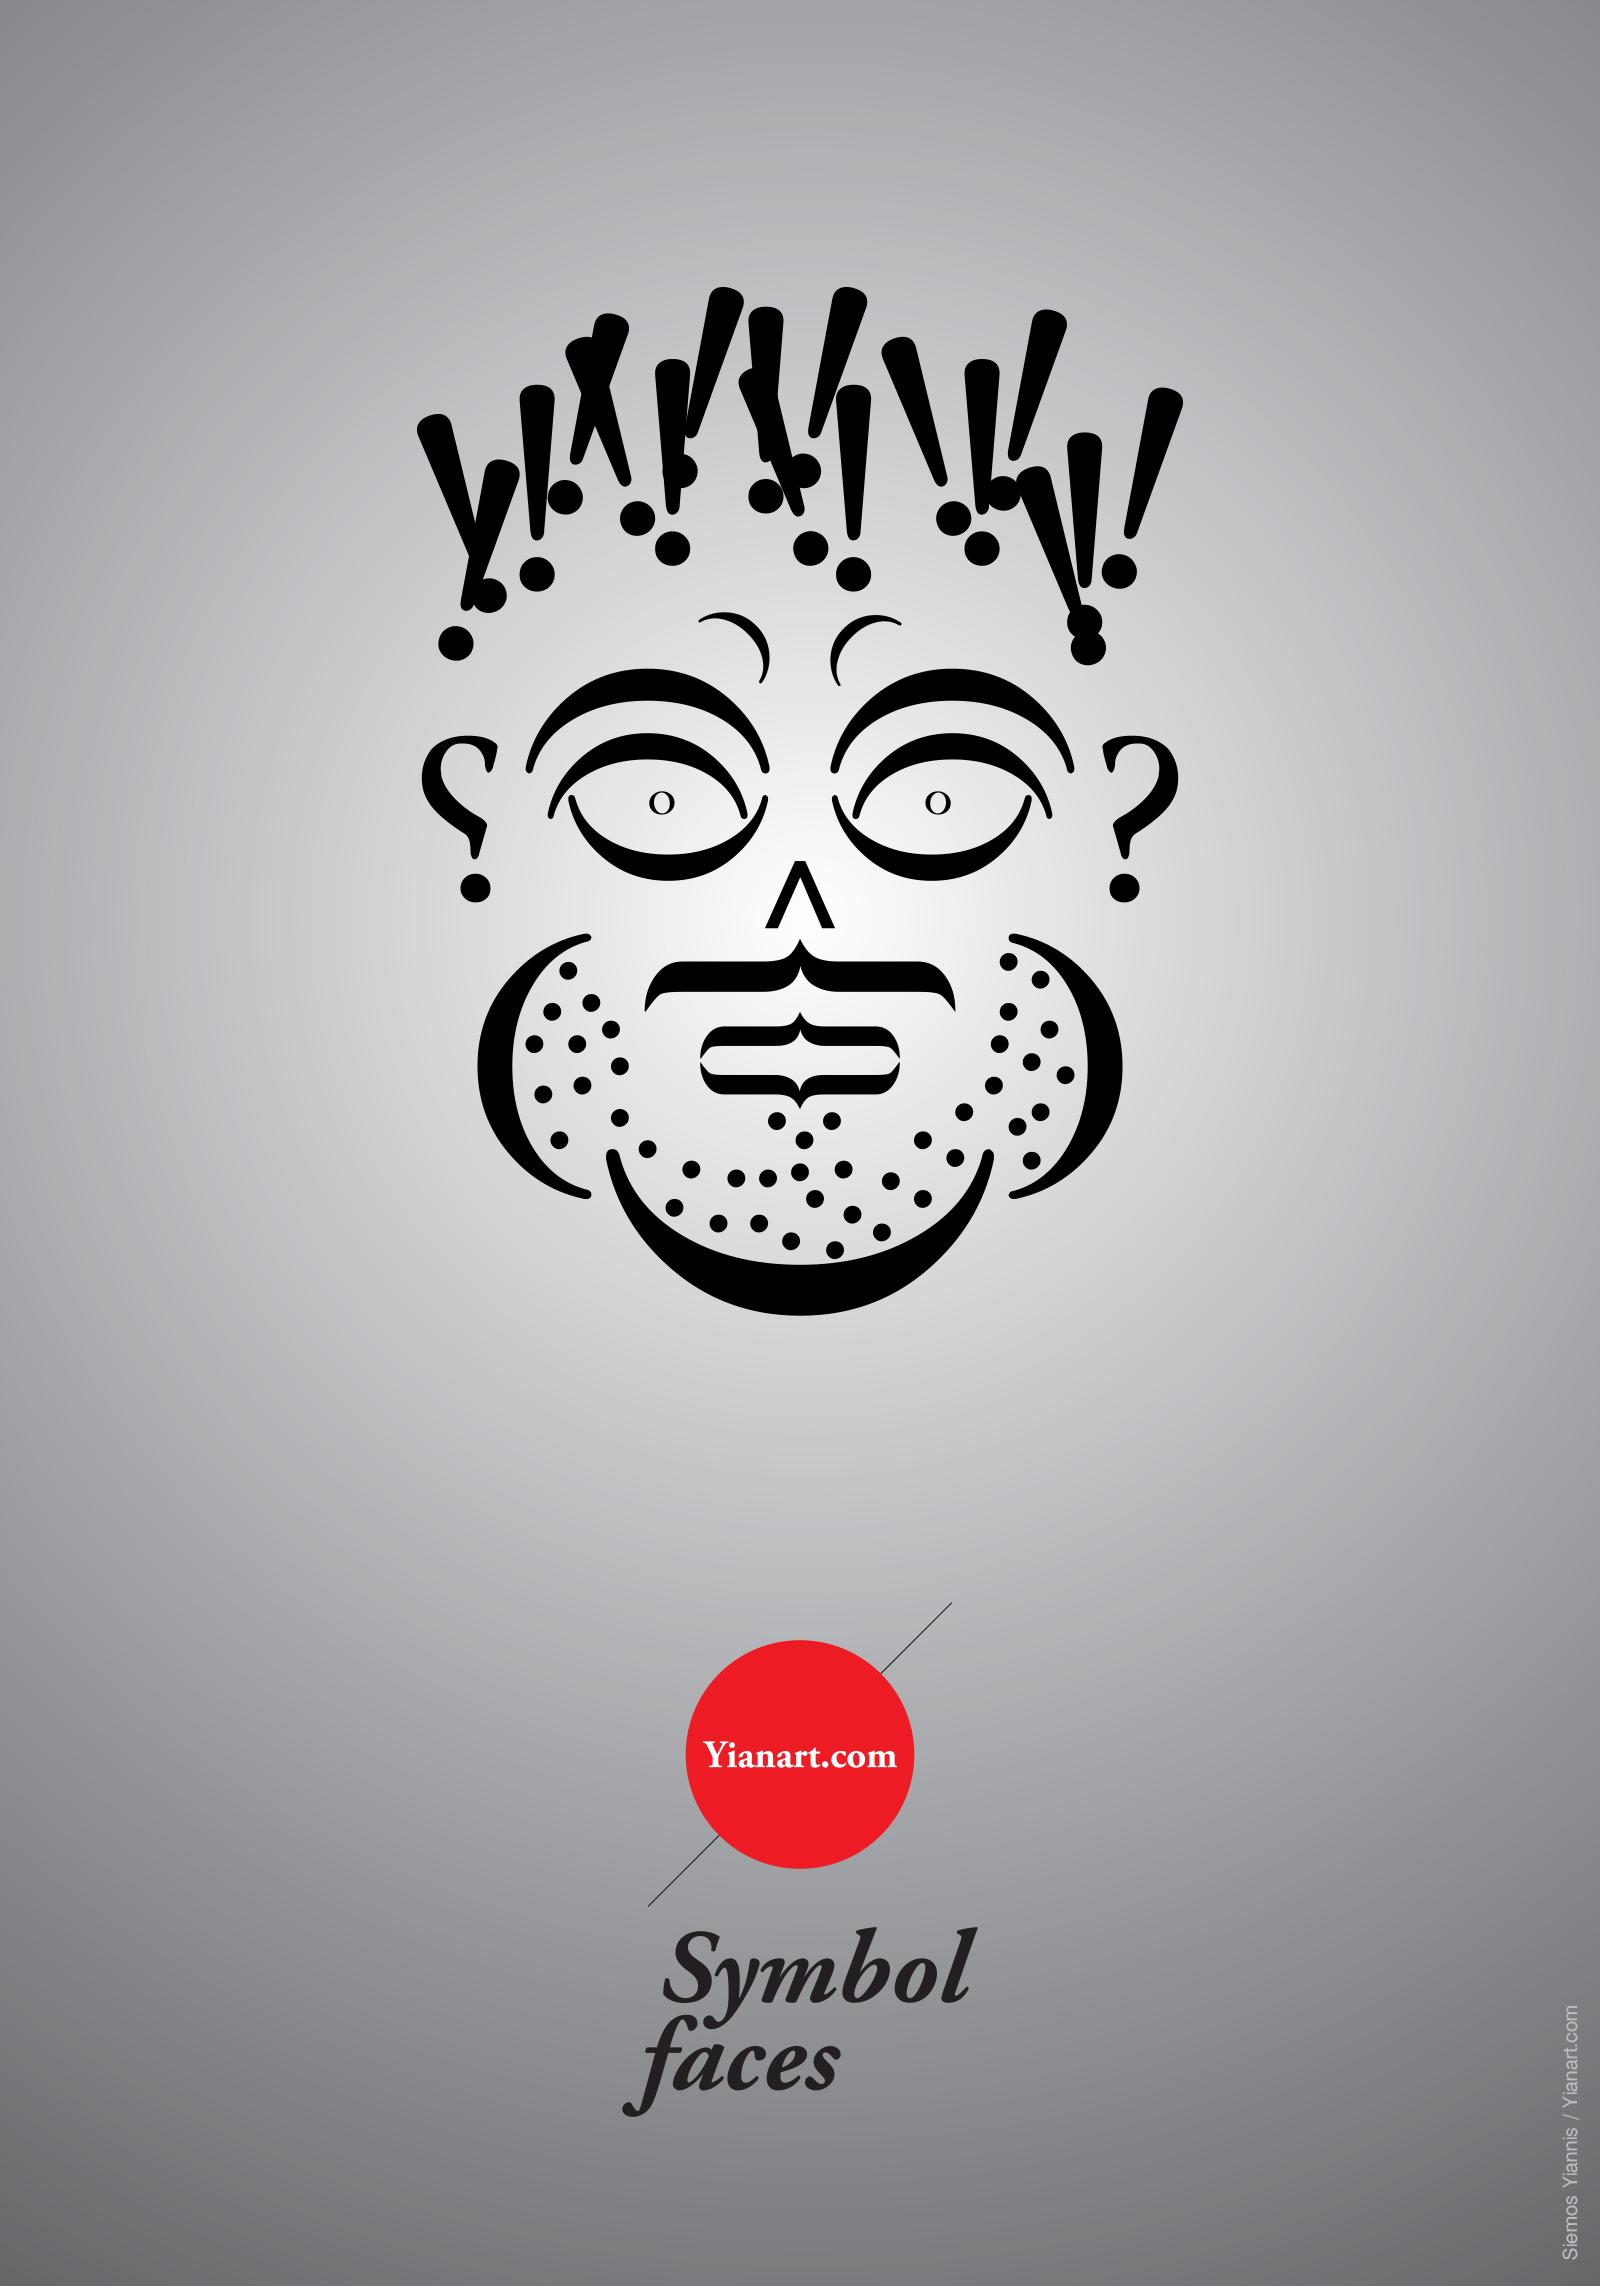 Symbol Faces_05_Yianart.com